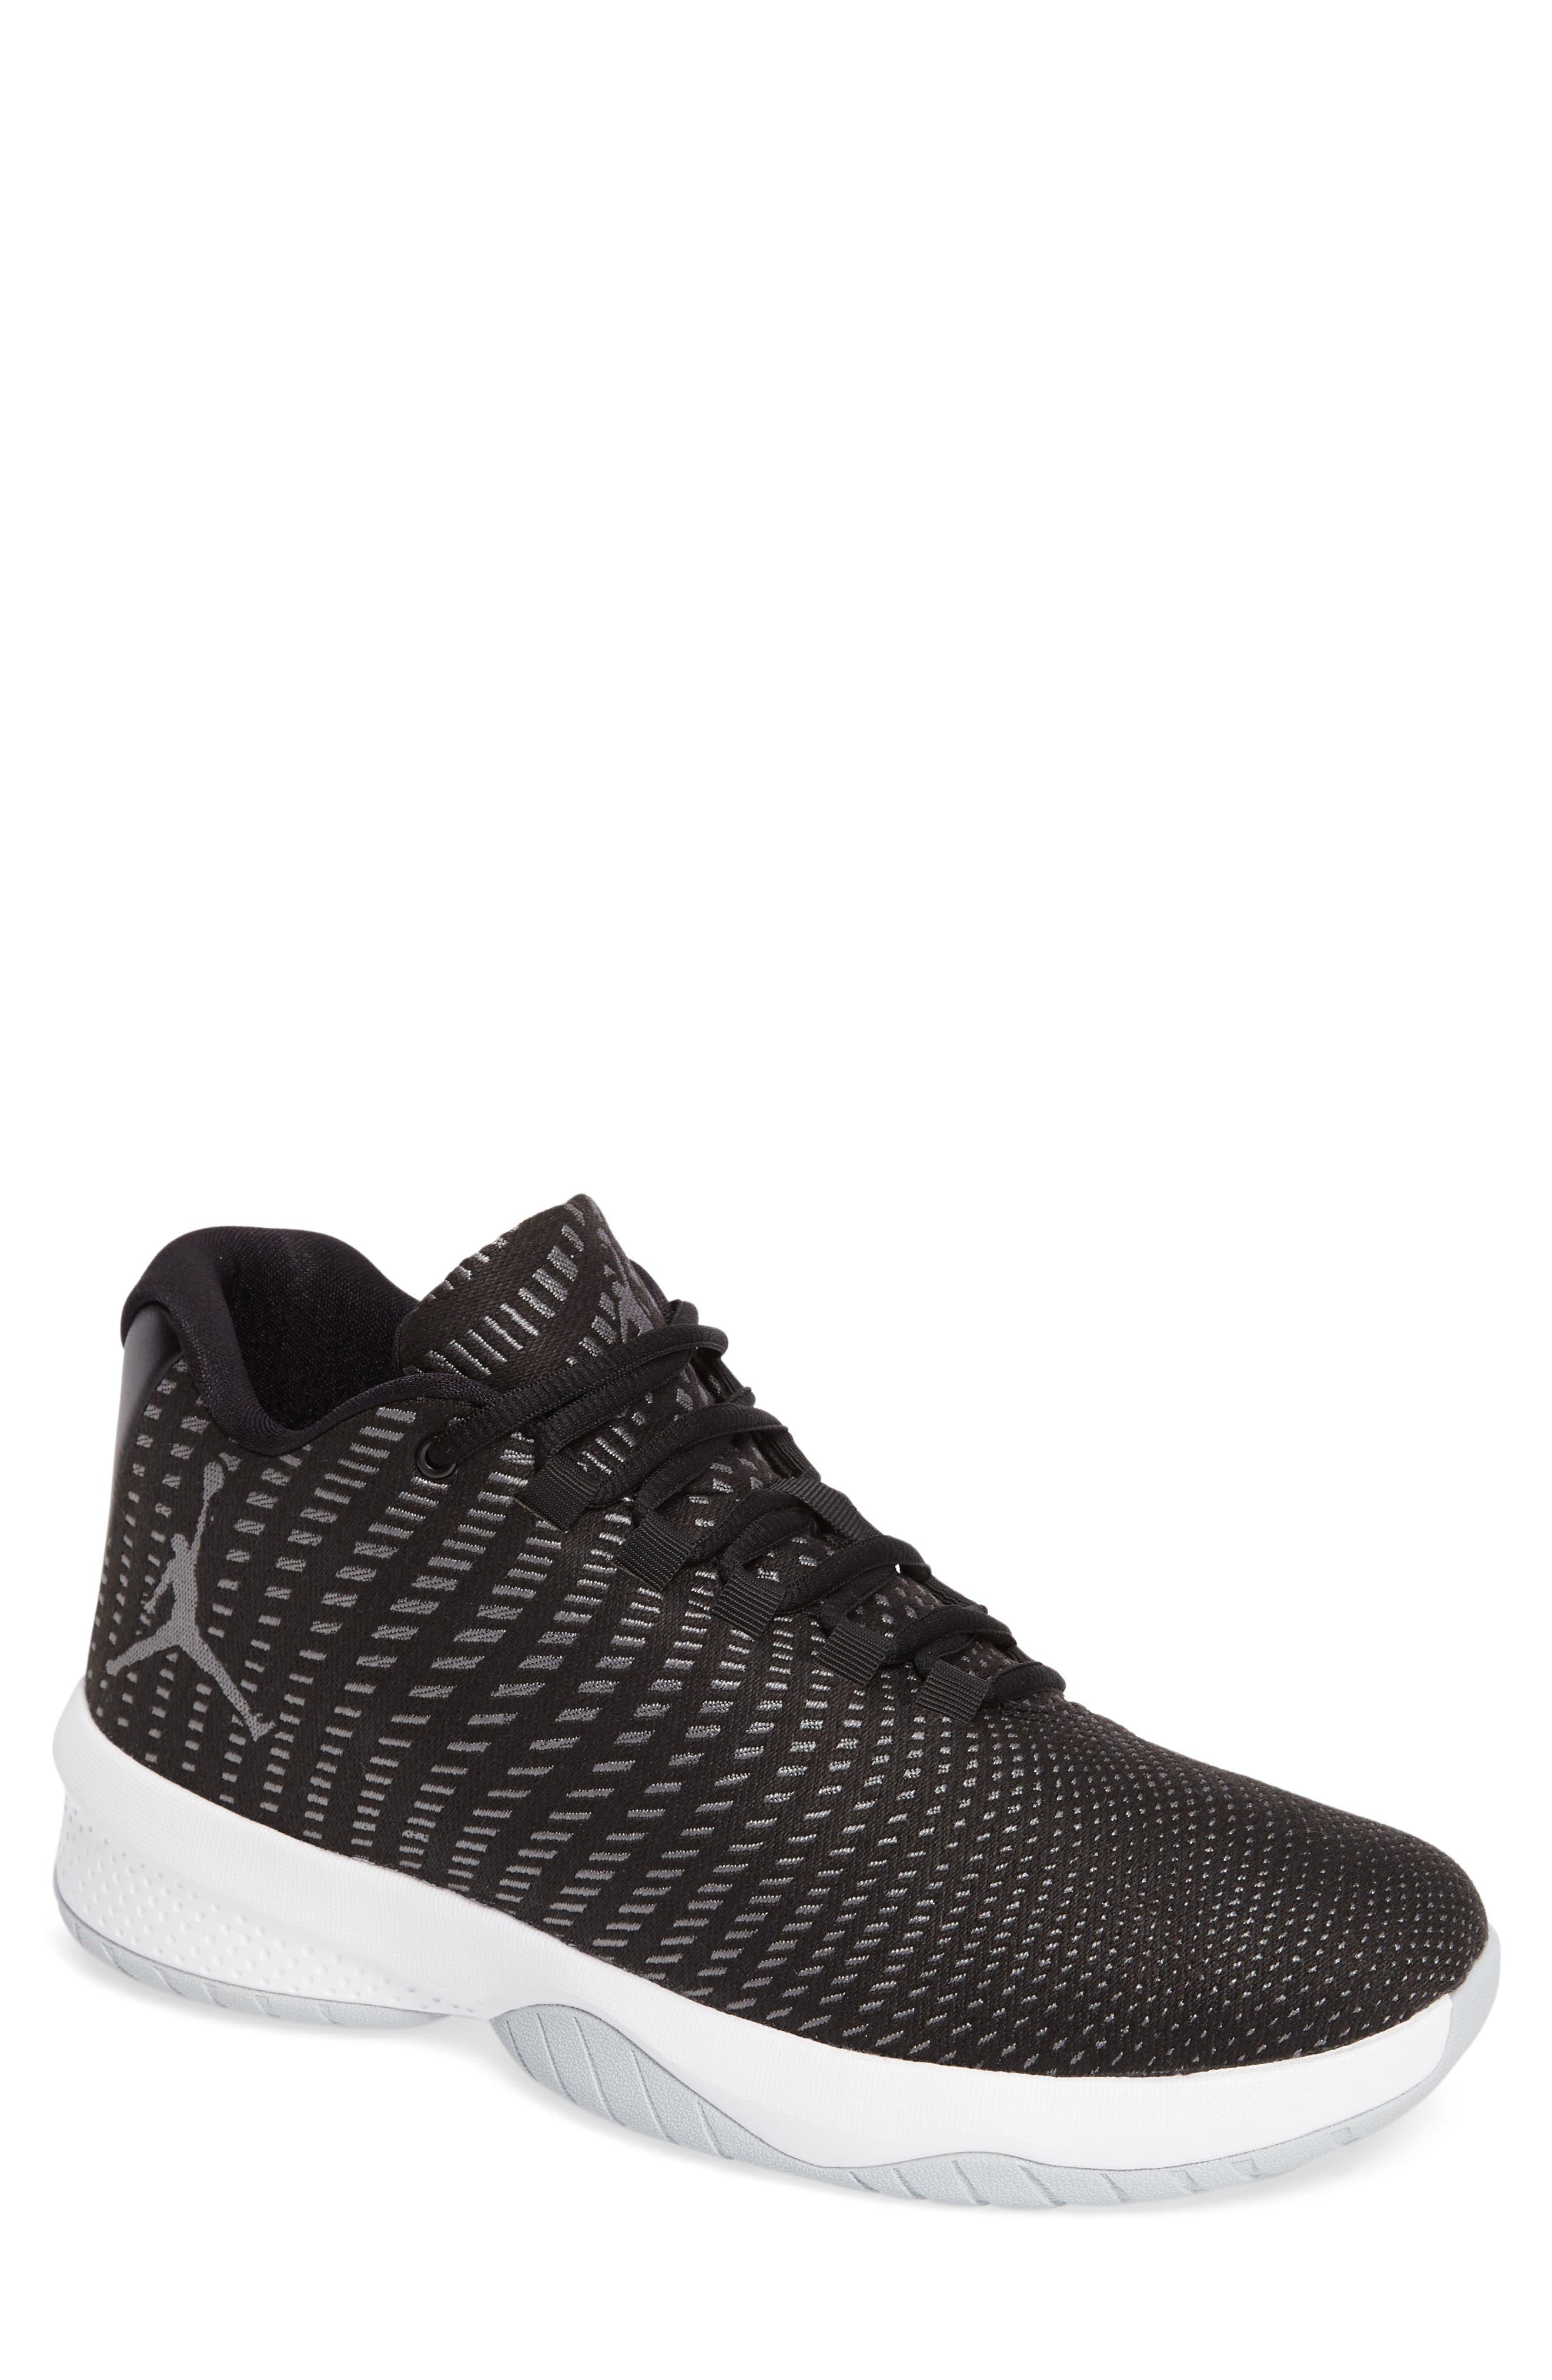 Main Image - Nike Jordan B. Fly Basketball Shoe (Men)